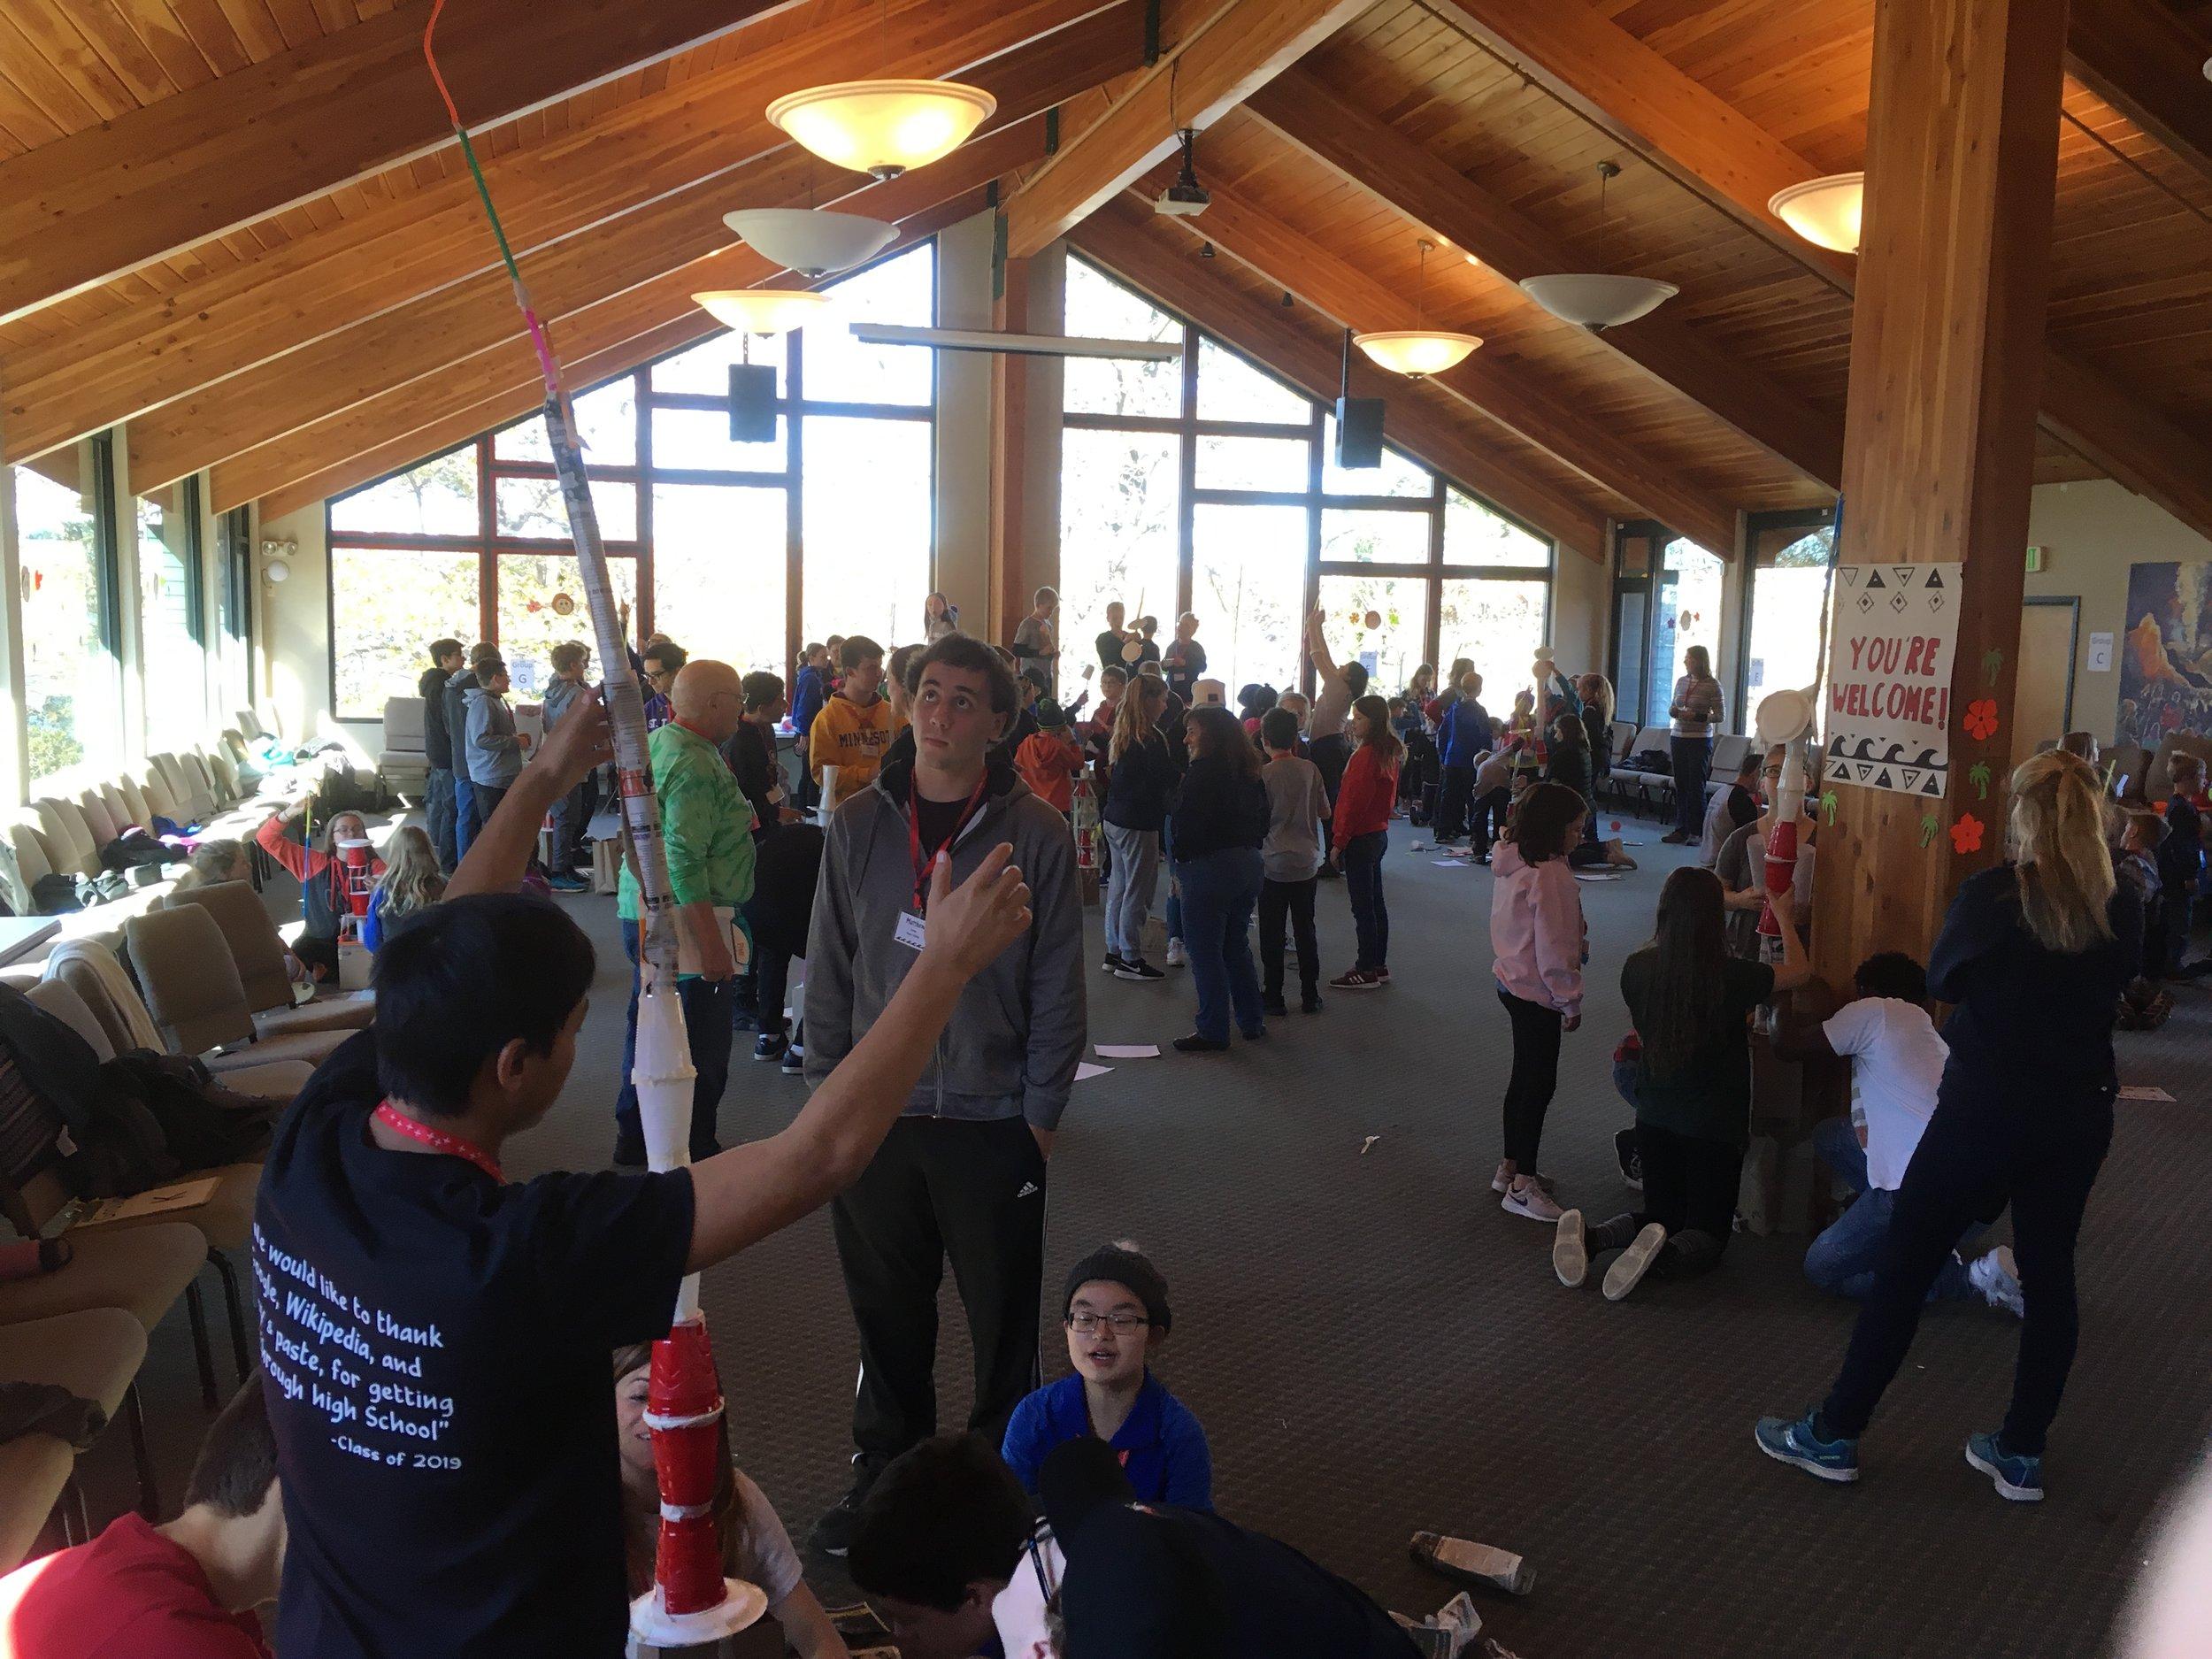 camp-odayin-strengths-retreat.jpg